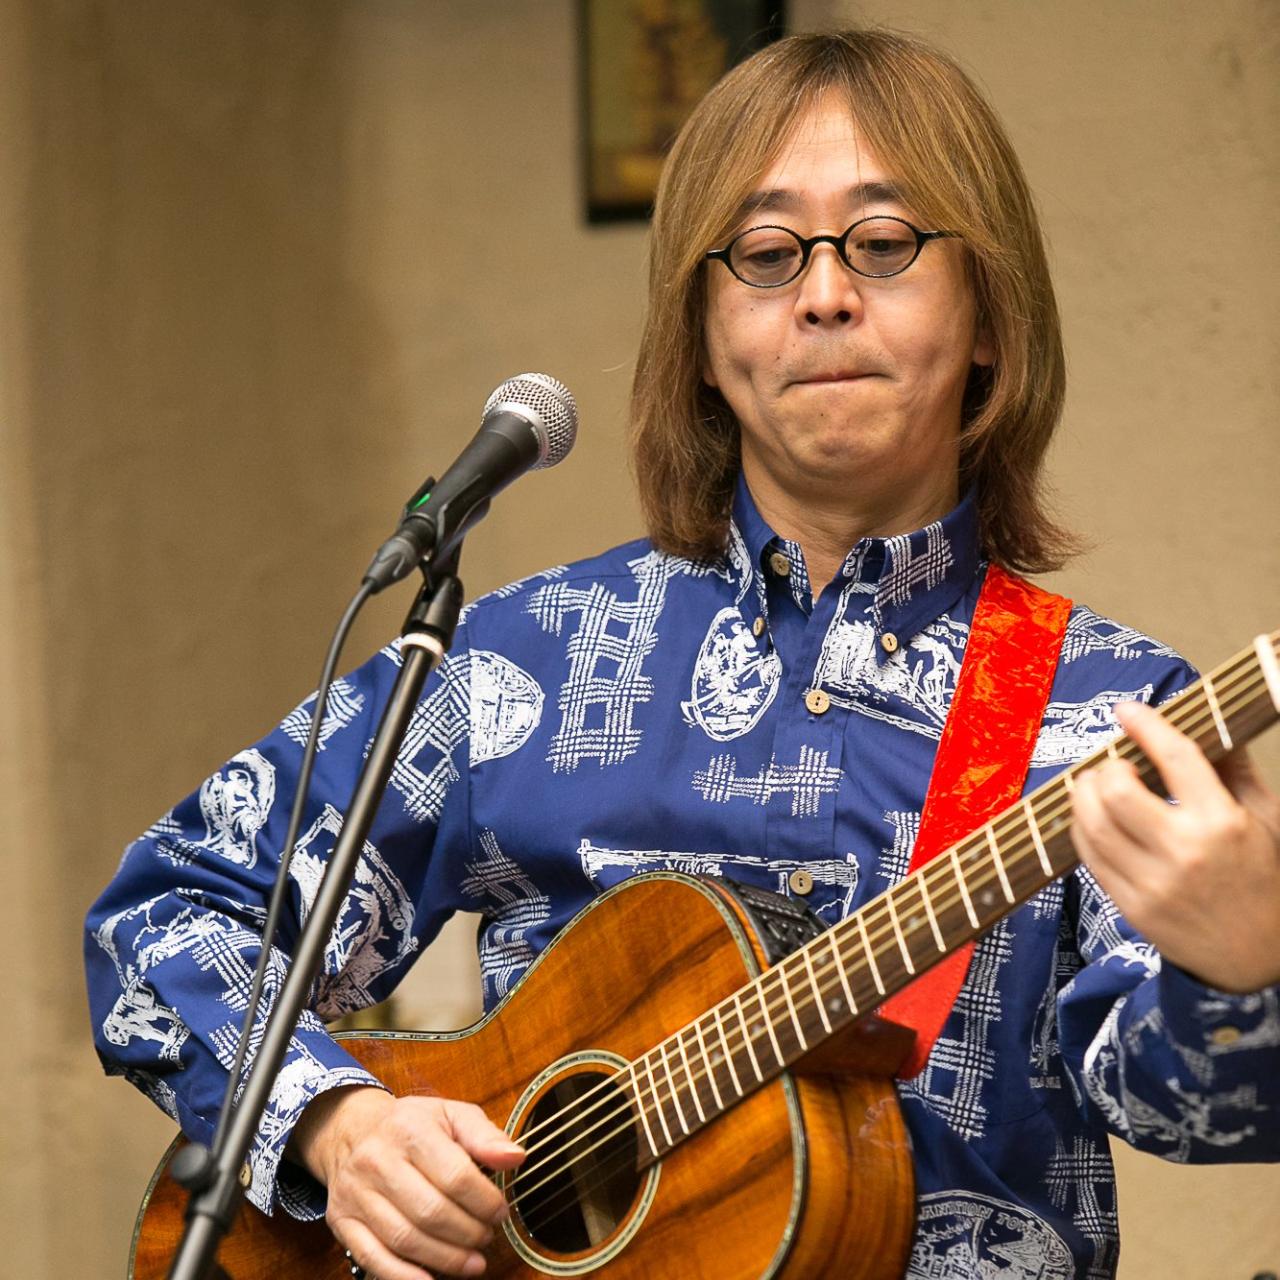 Juke OkaYoshi